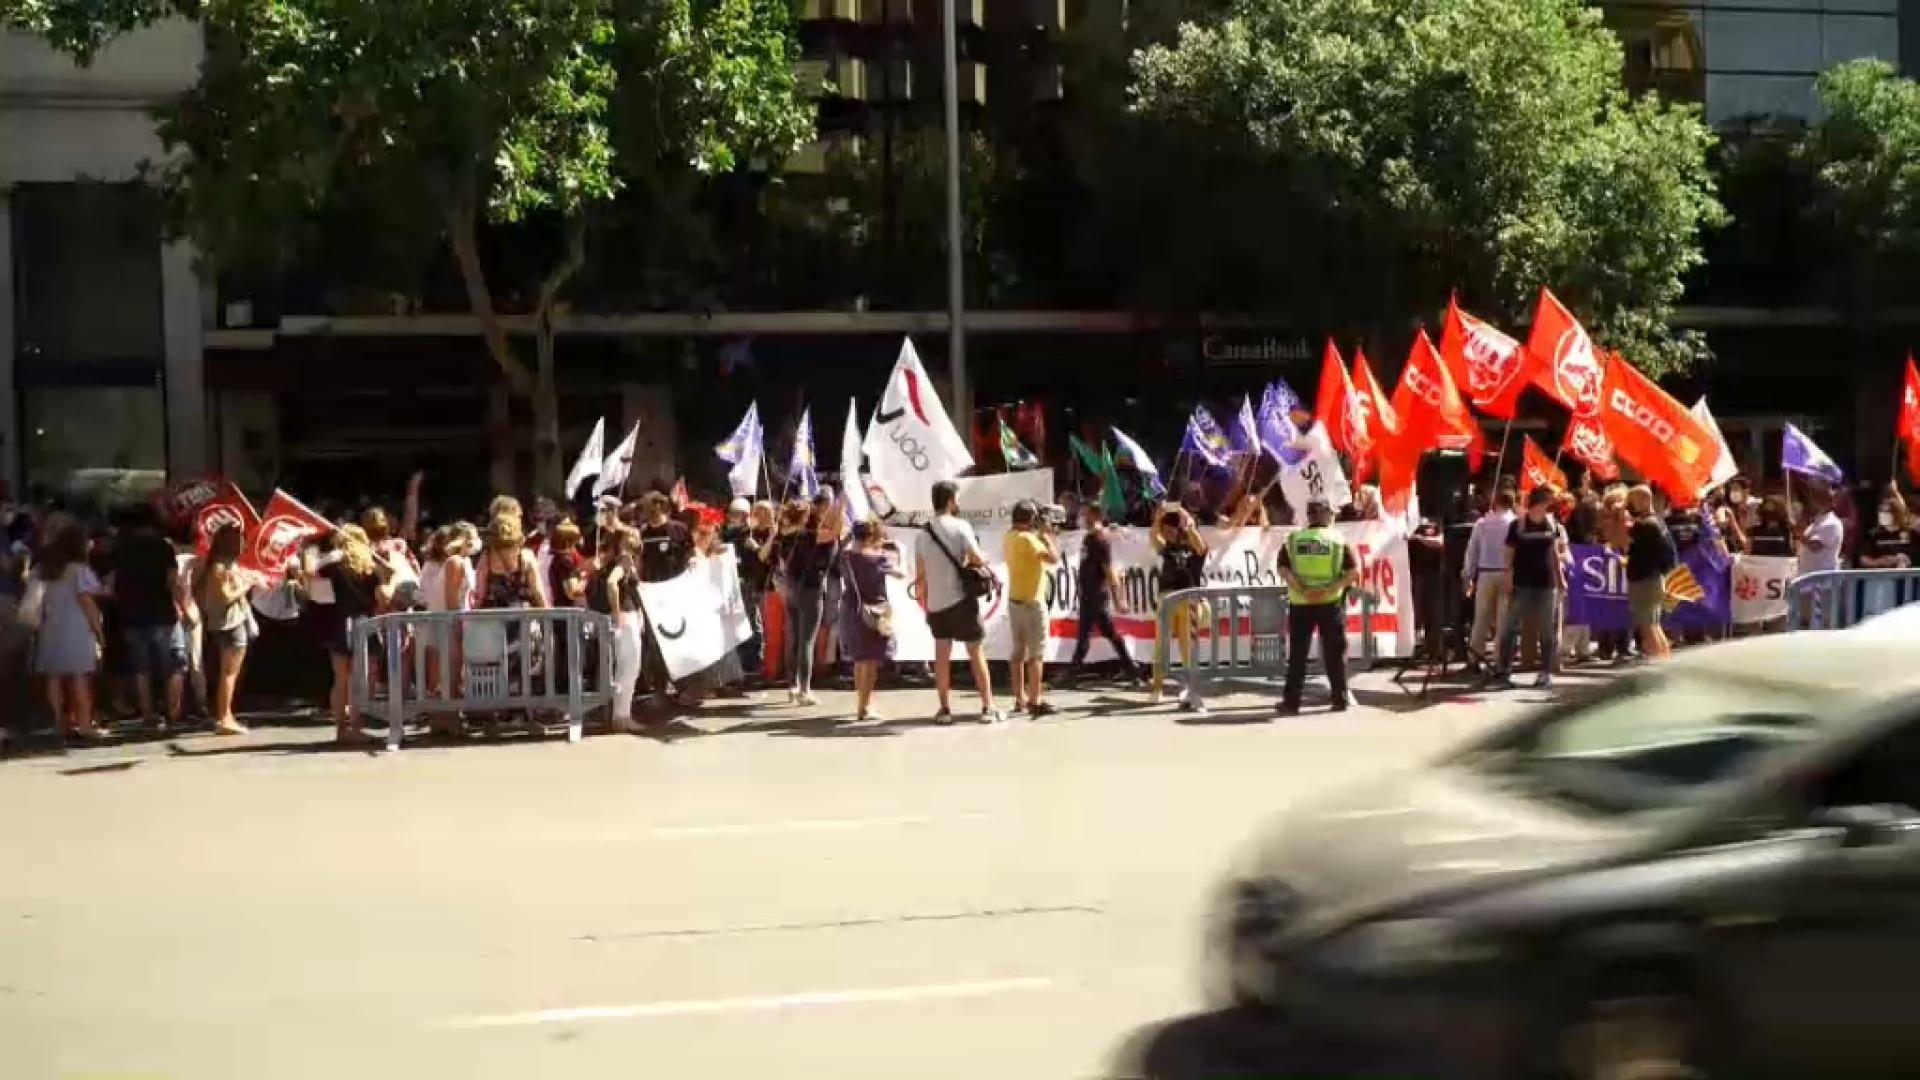 300+treballadors+de+Caixabank+protesten+contra+l%27ERO